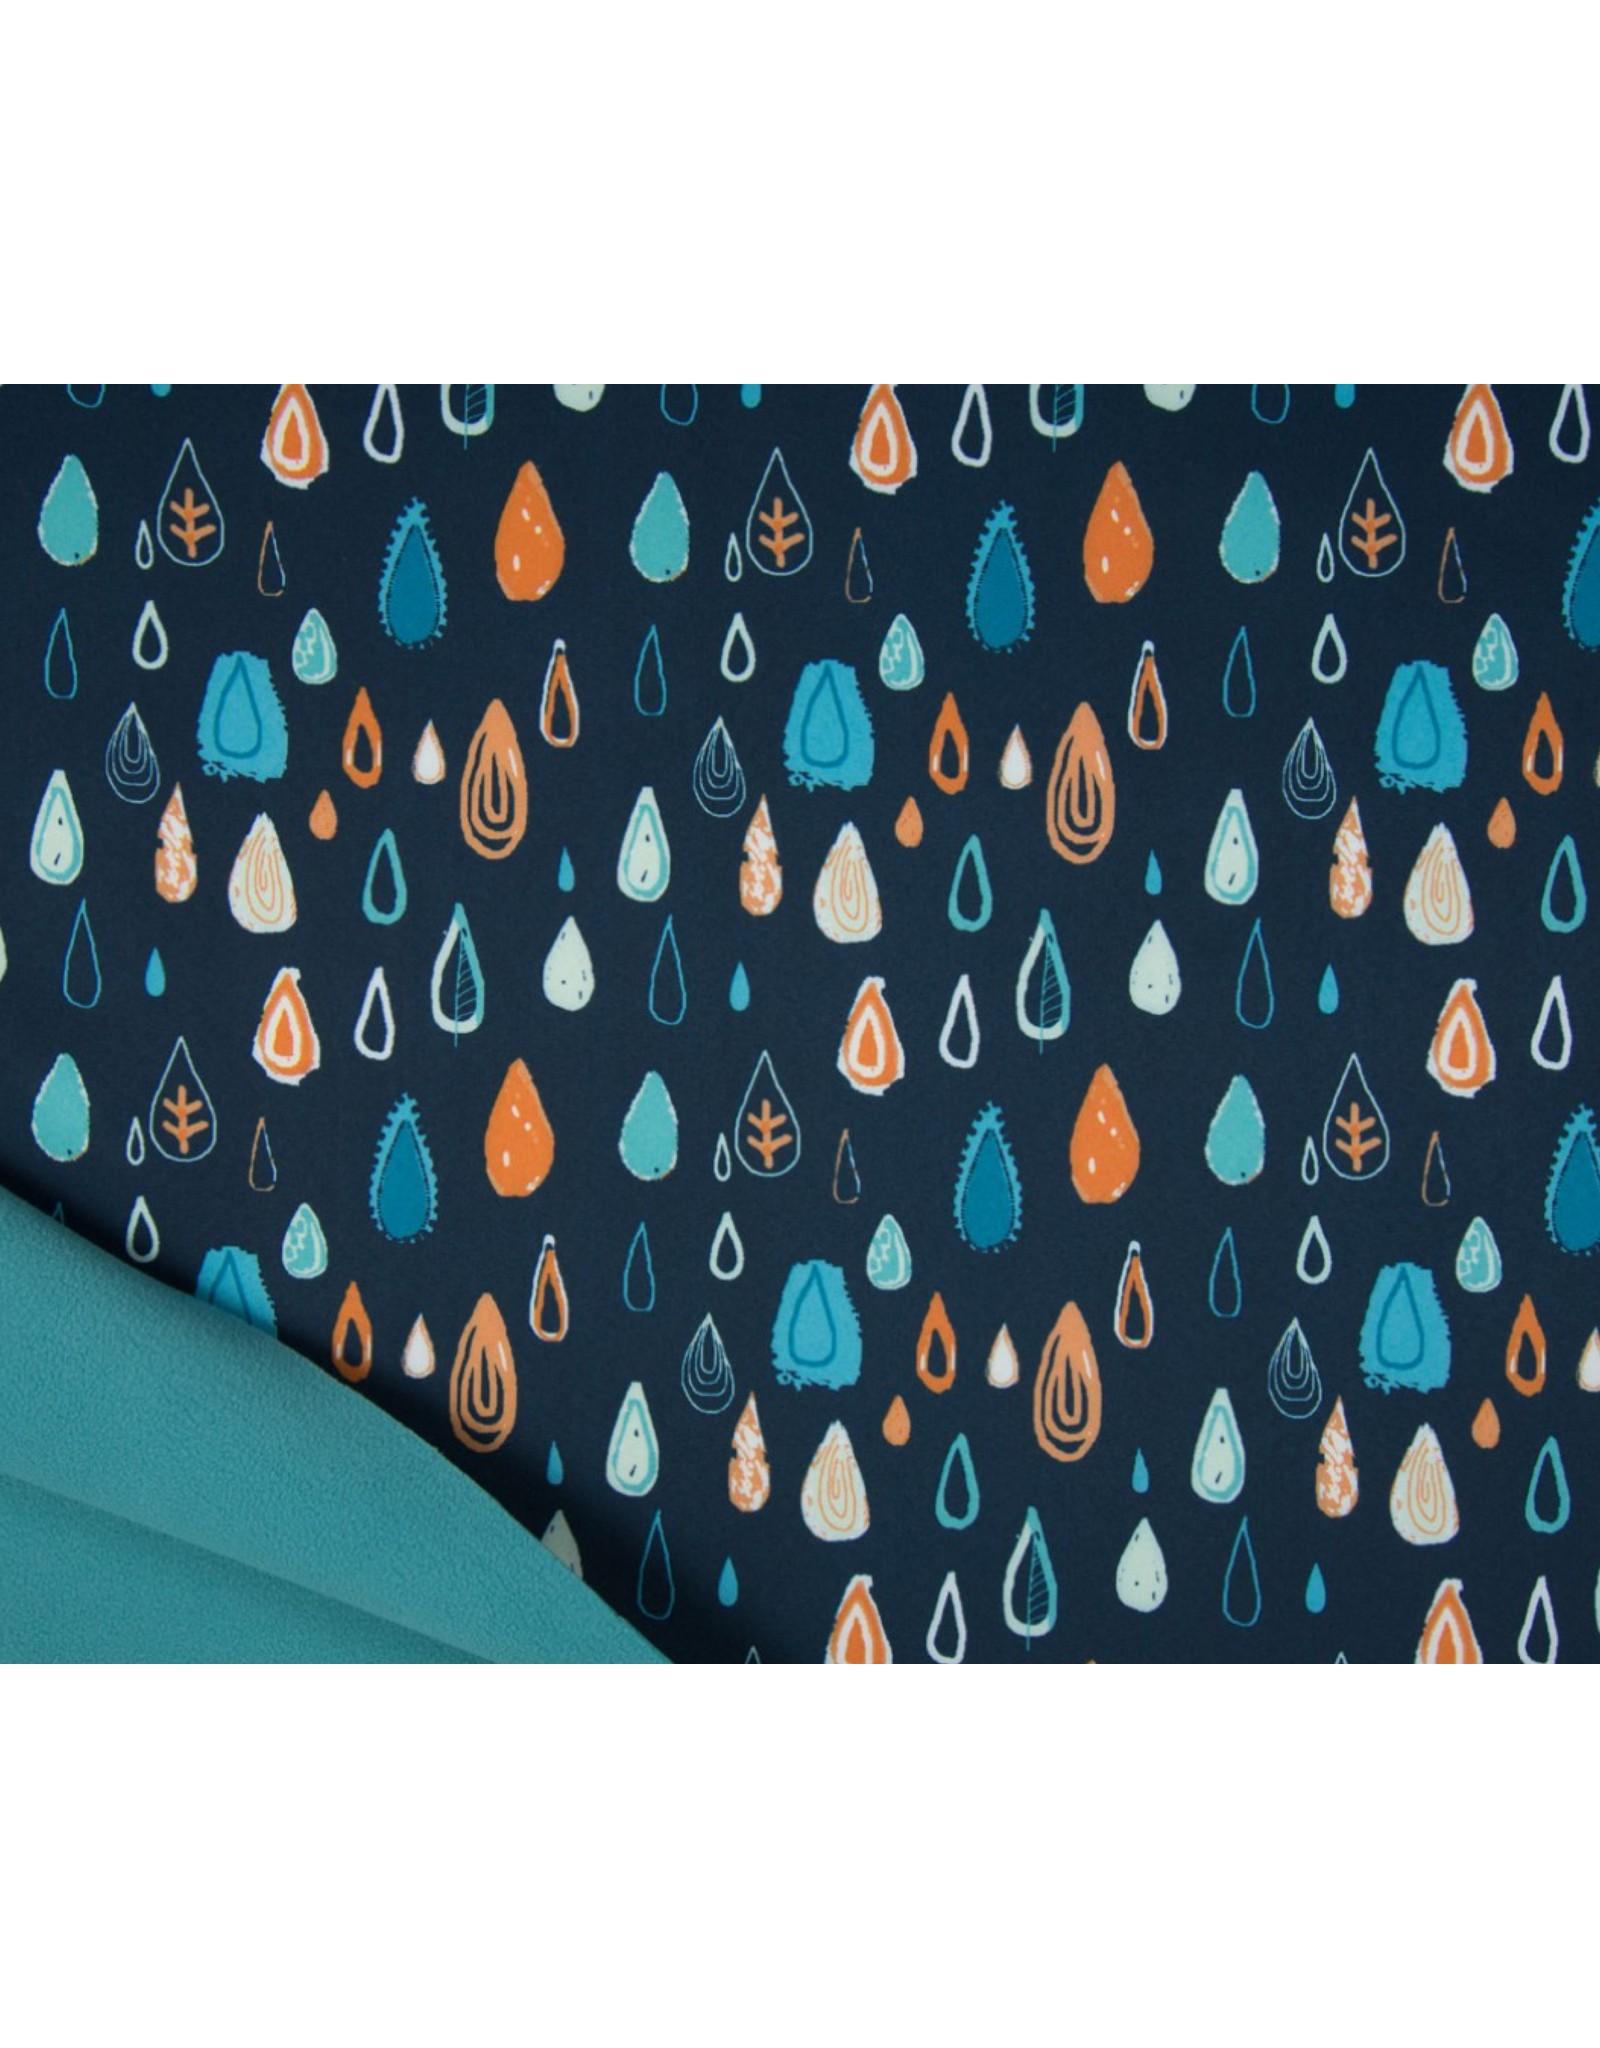 Softshell stoff Bedruckt - Raindrops Navy